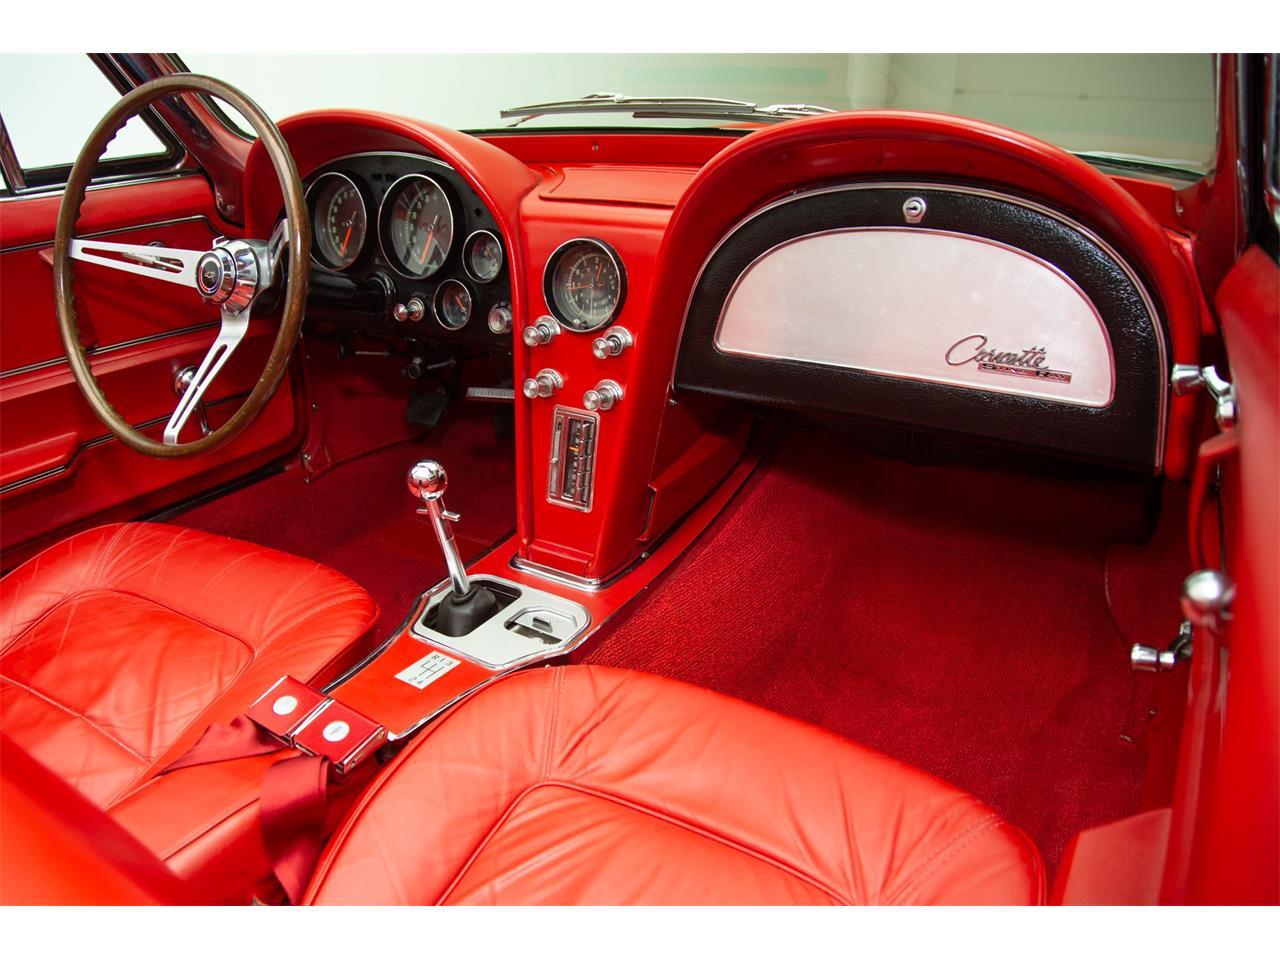 1965 Chevrolet Corvette (CC-1228670) for sale in Des Moines, Iowa